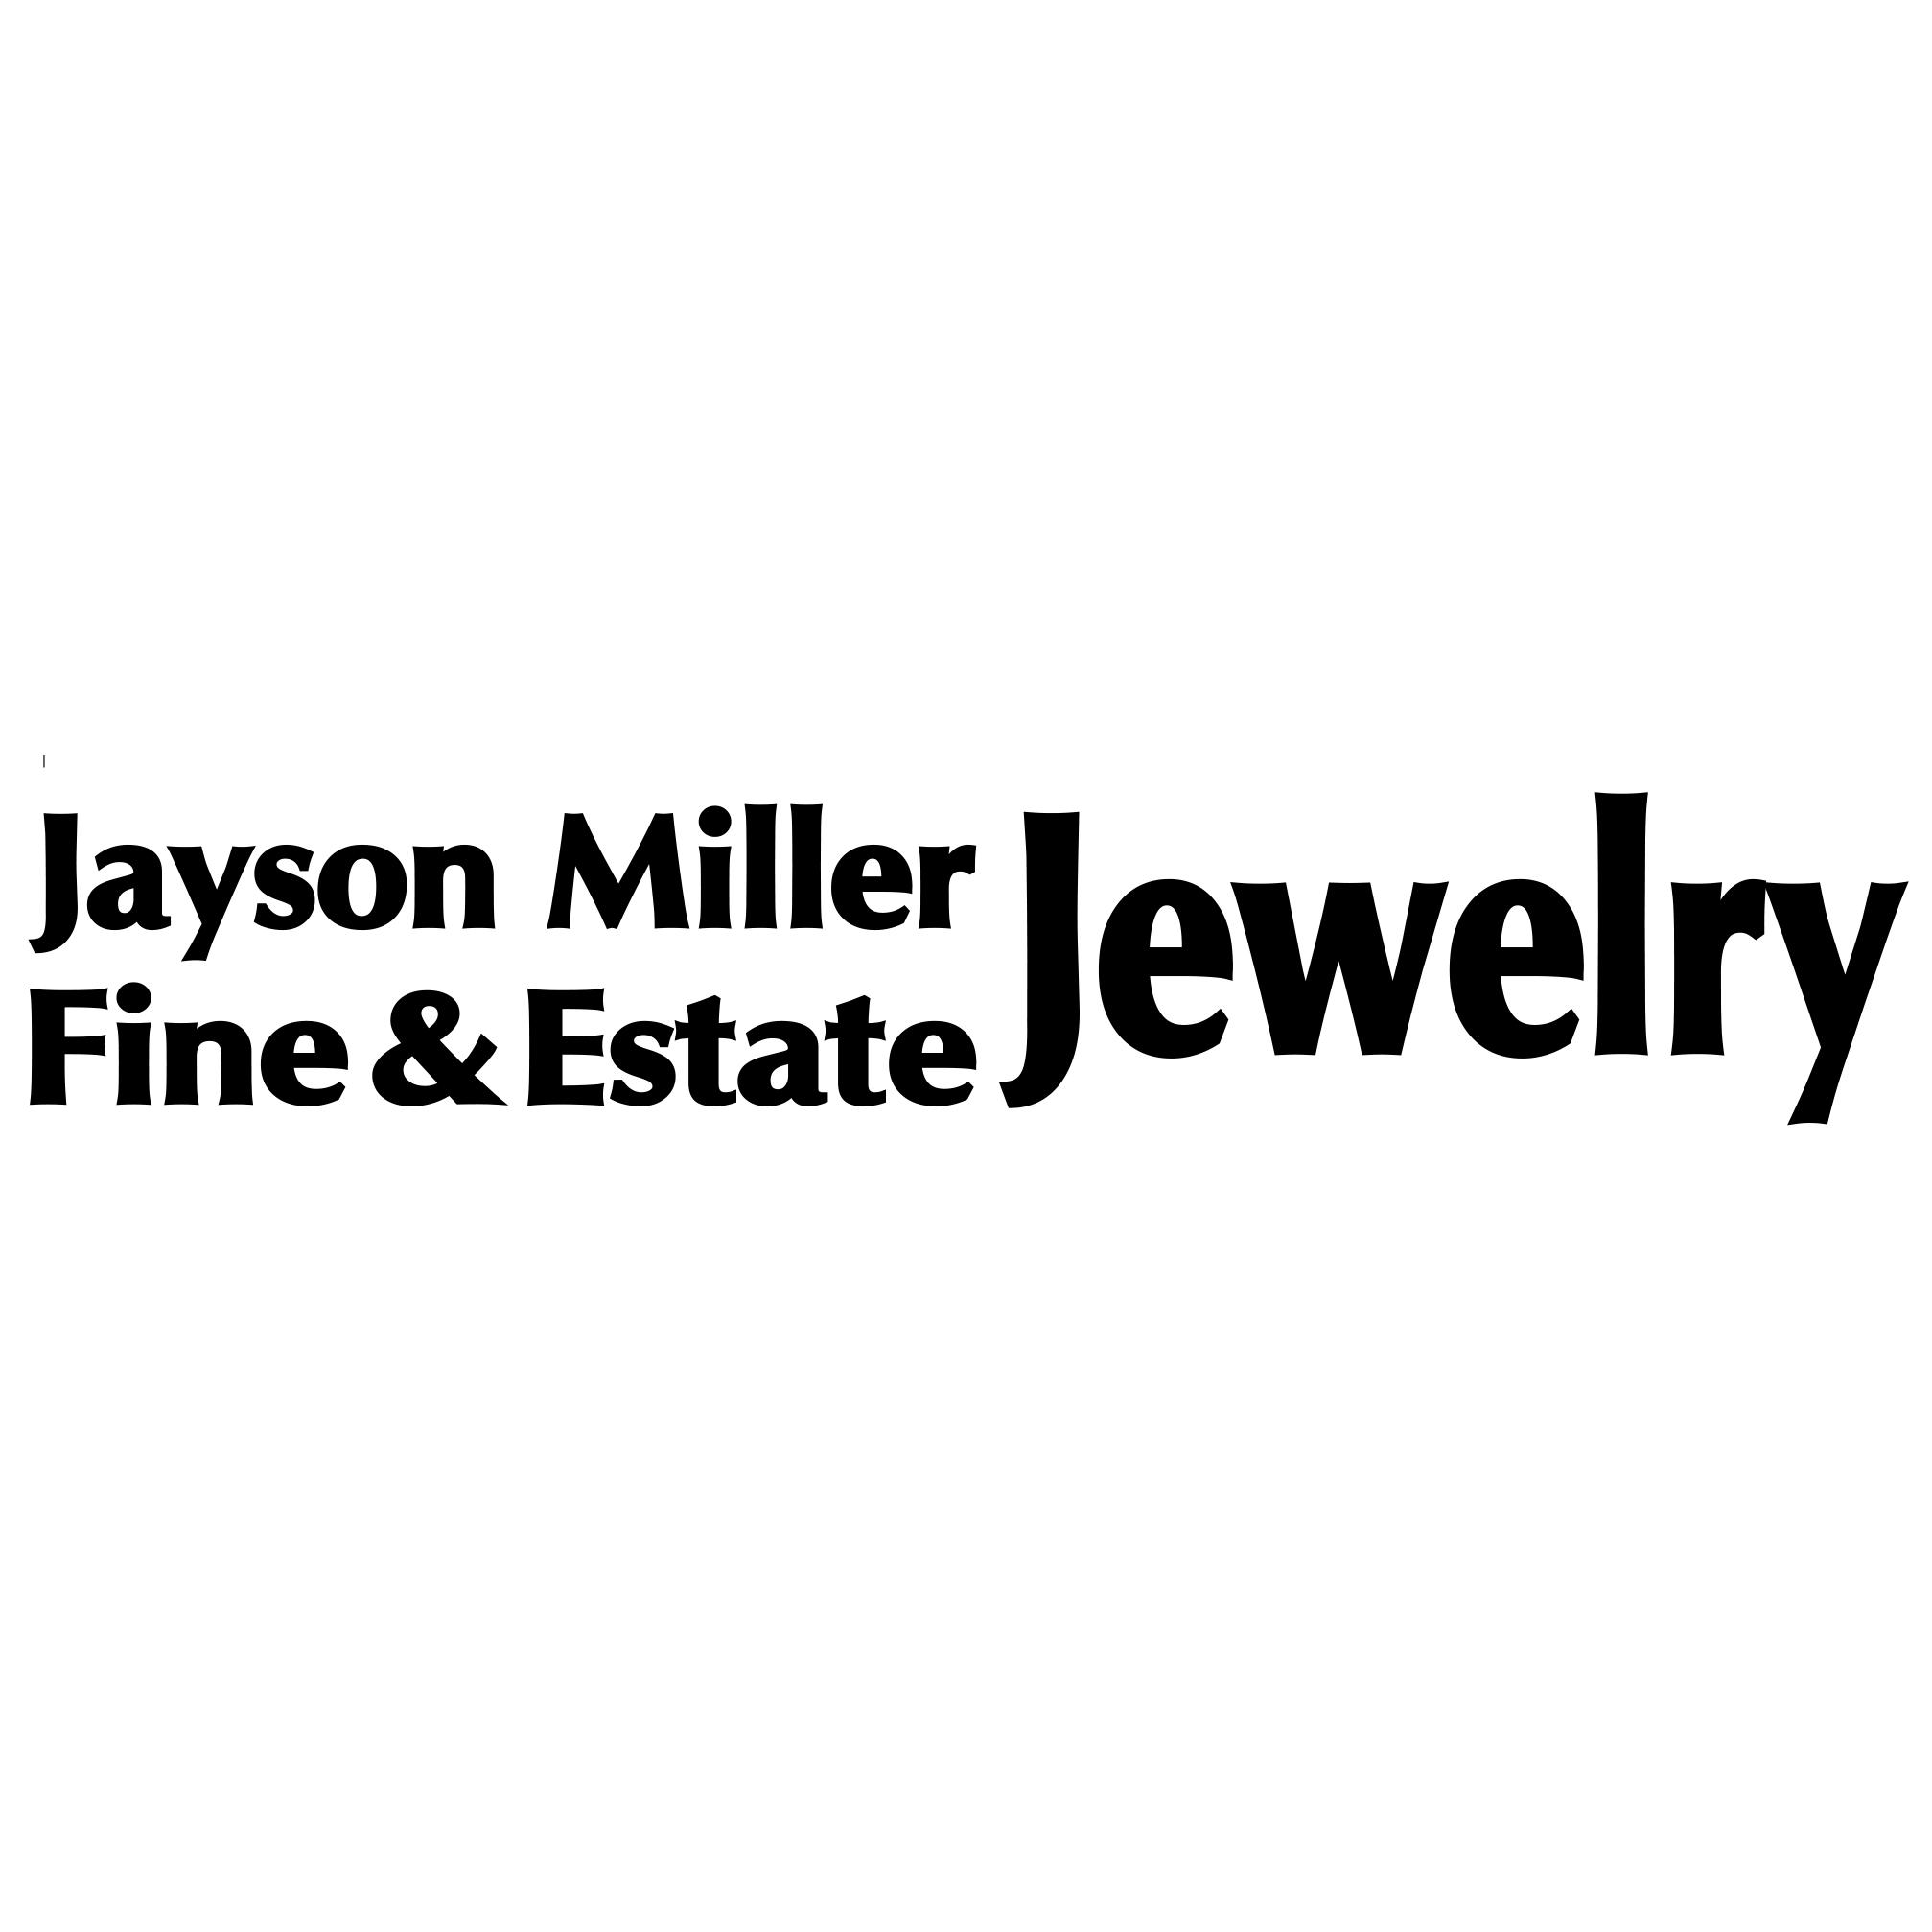 Jayson Miller Fine & Estate Jewelry - Tempe, AZ 85284 - (480)491-5162   ShowMeLocal.com